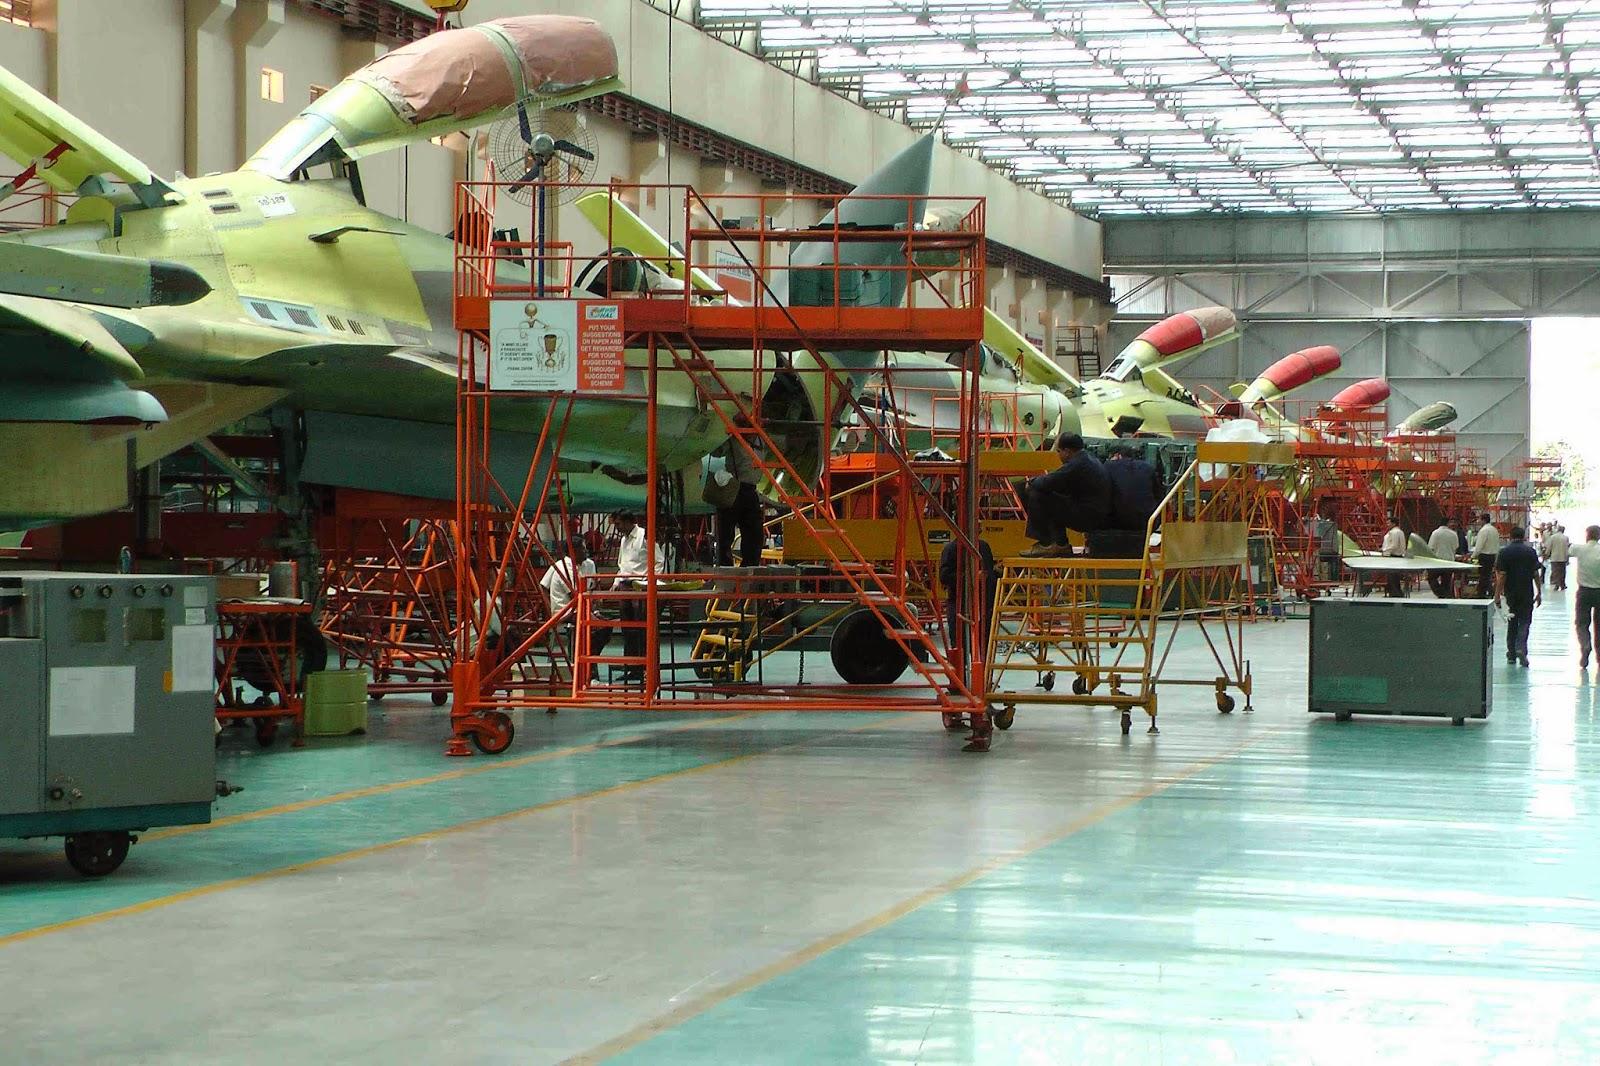 Cборка истребителей Су-30МКИ на предприятии индийского государственного объединения Hindustan Aeronautics Limited (HAL) в Насике, 2013 год.